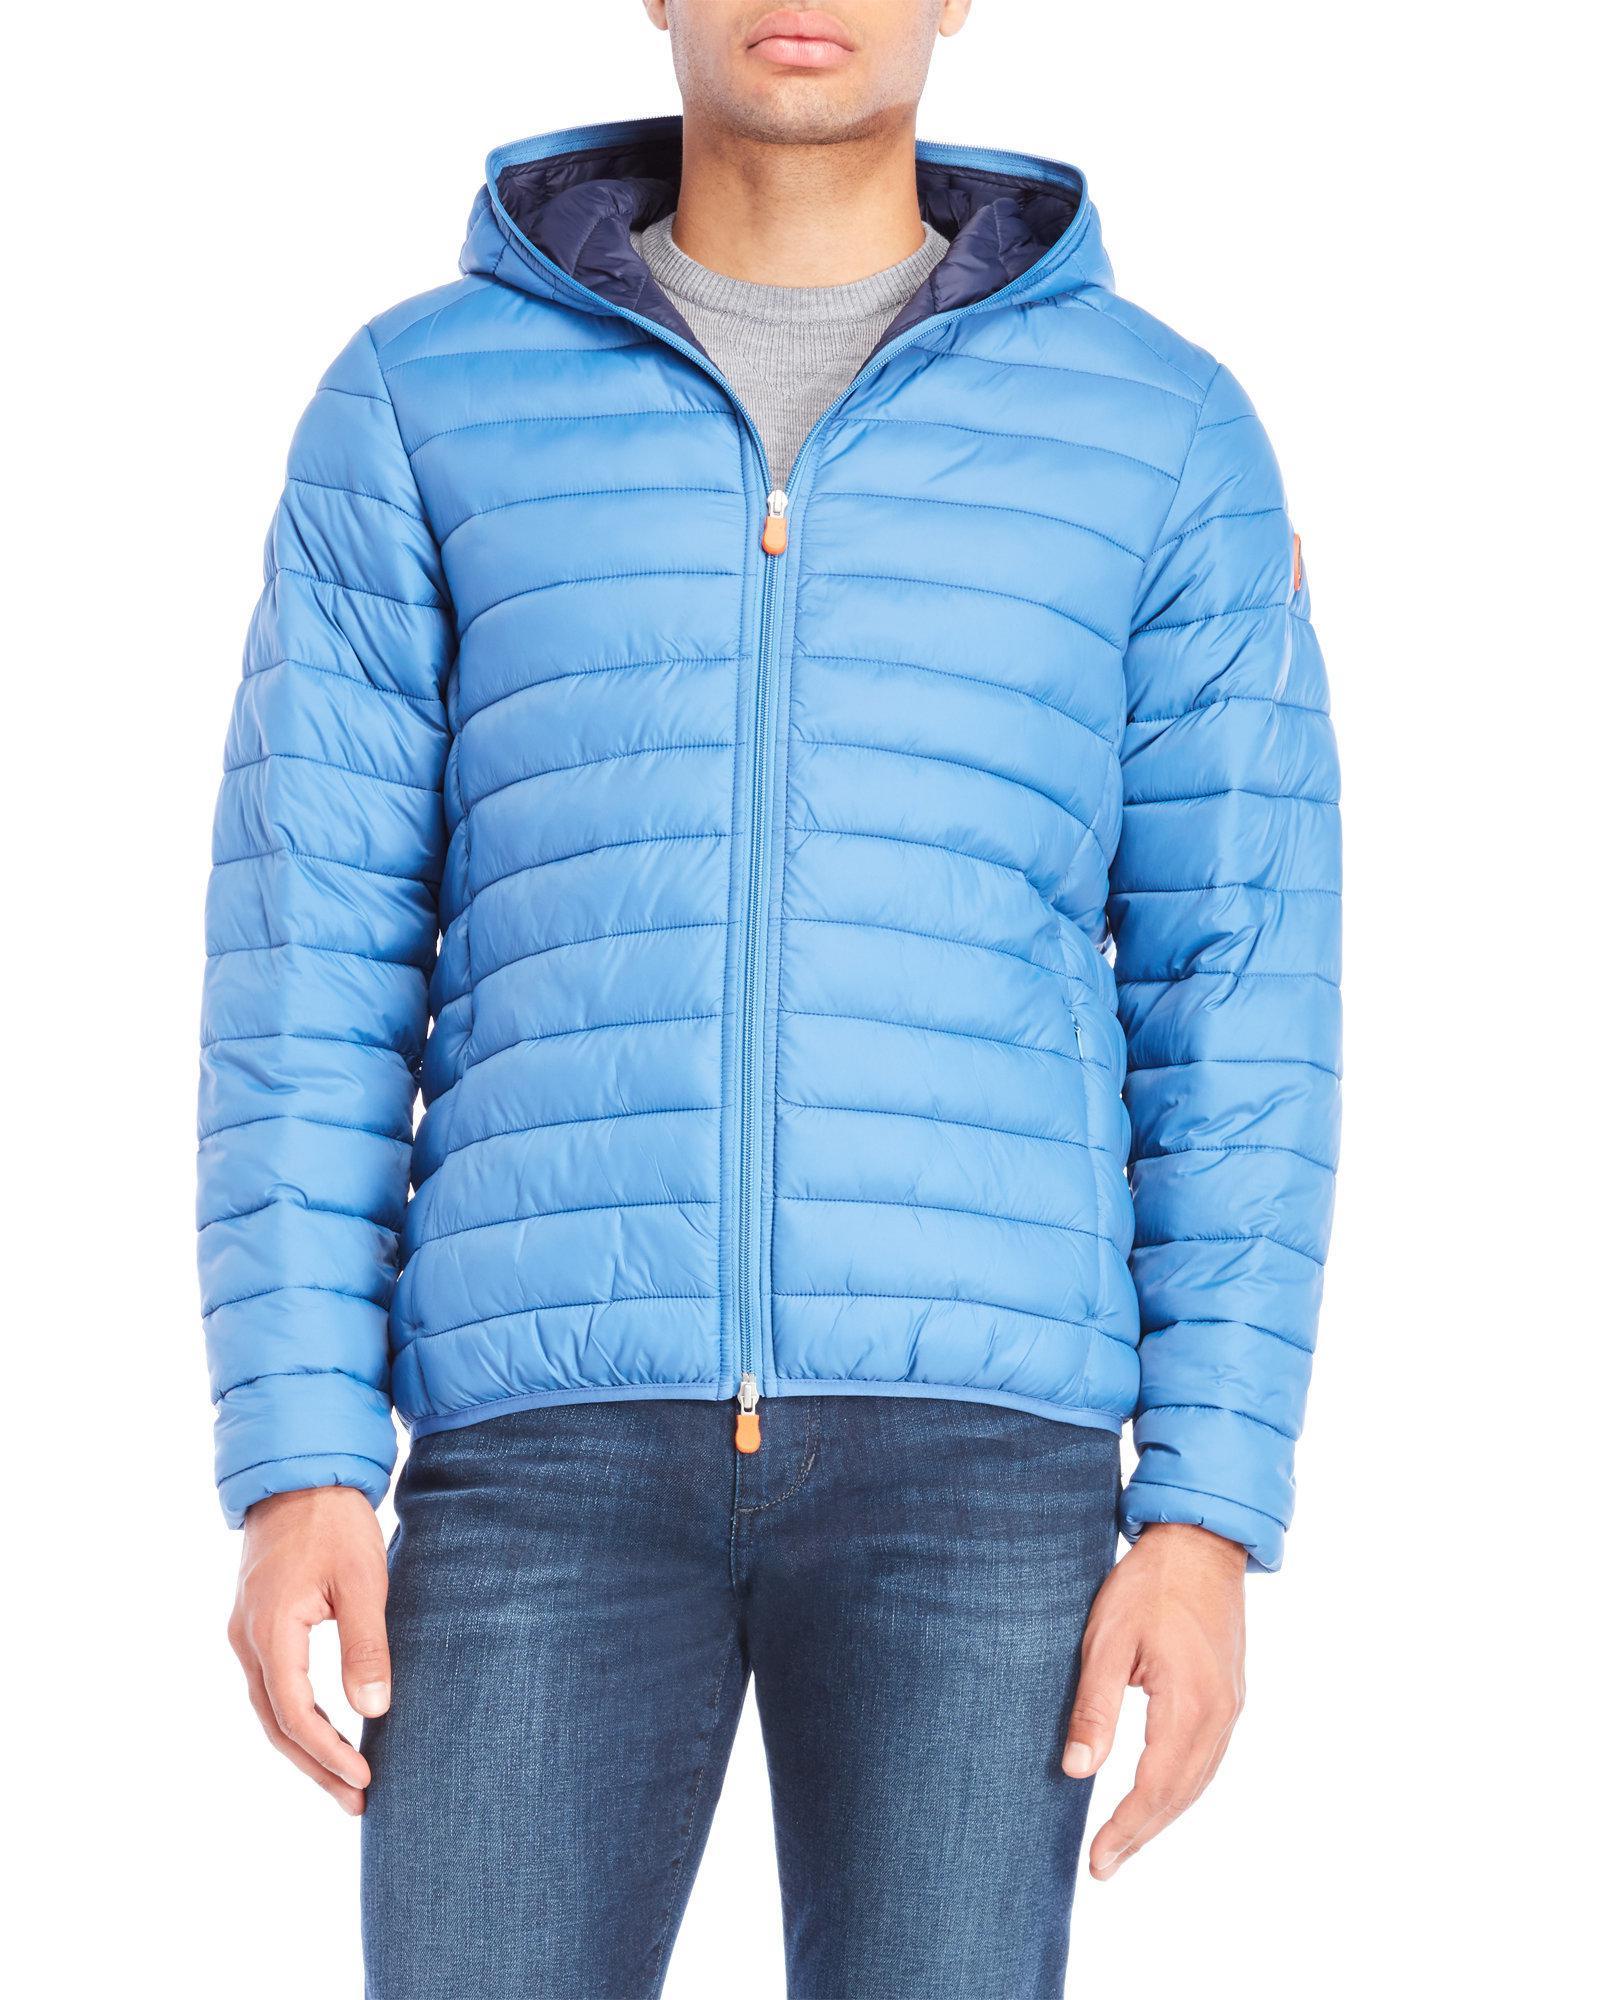 9a4d5a1576 https   www.lyst.com clothing farrow-riley-top  2017-11-08T12 19 ...